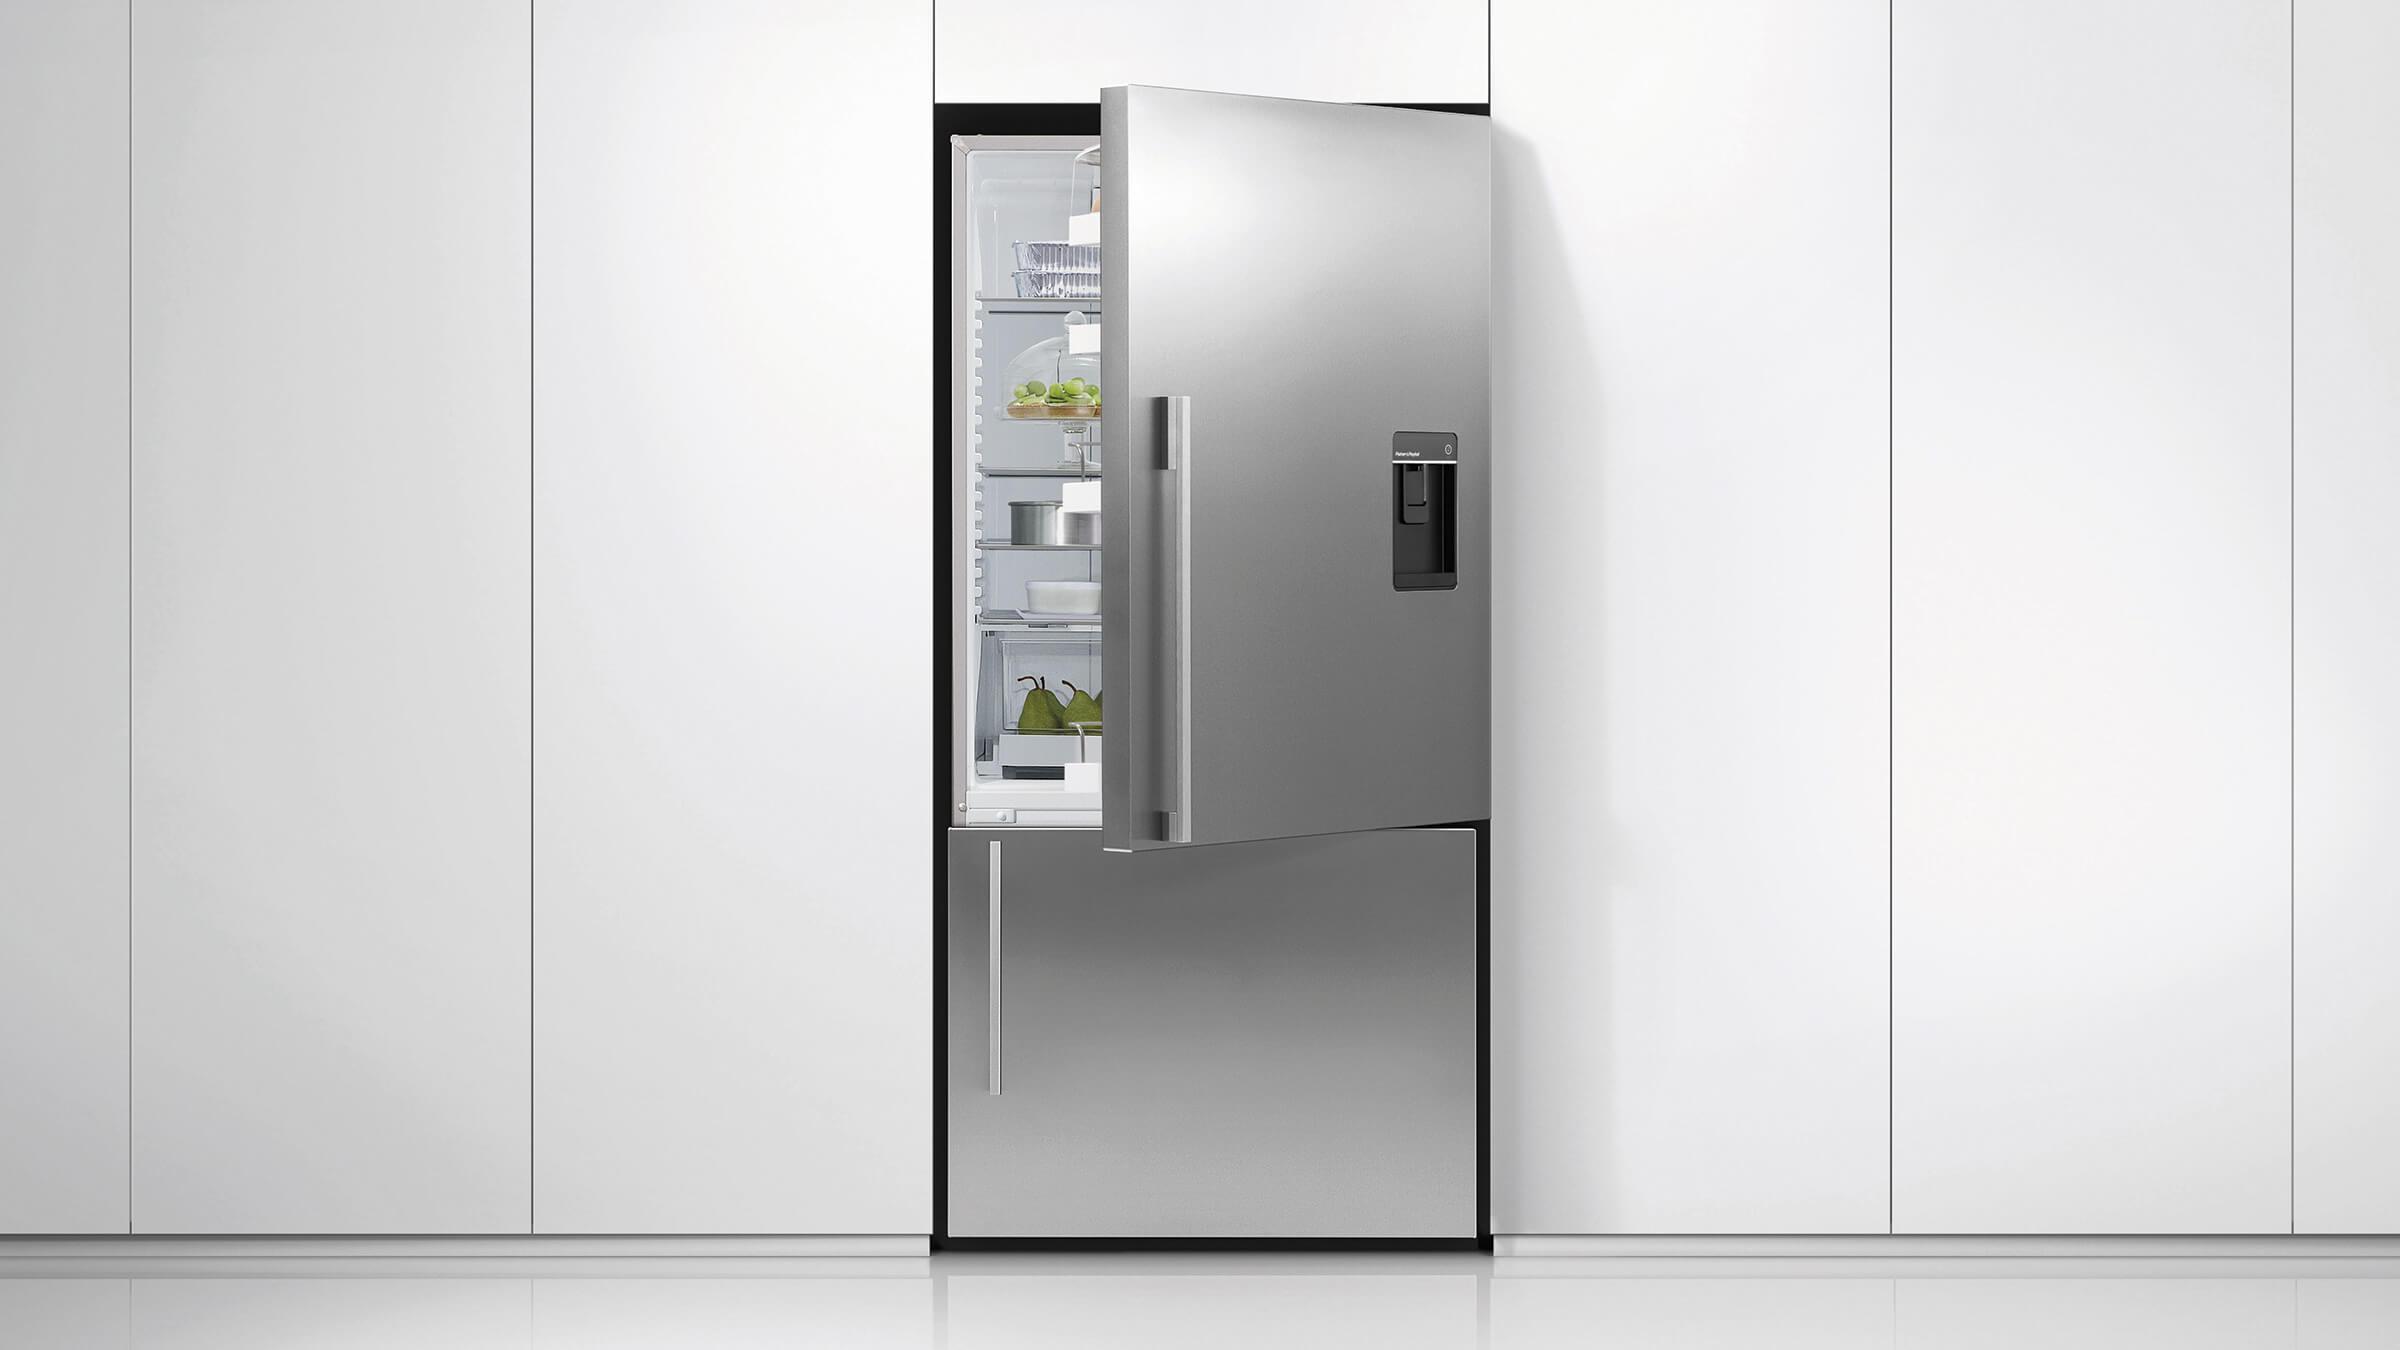 Refrigerators Refrigeration Frigidaire Gallery Collection